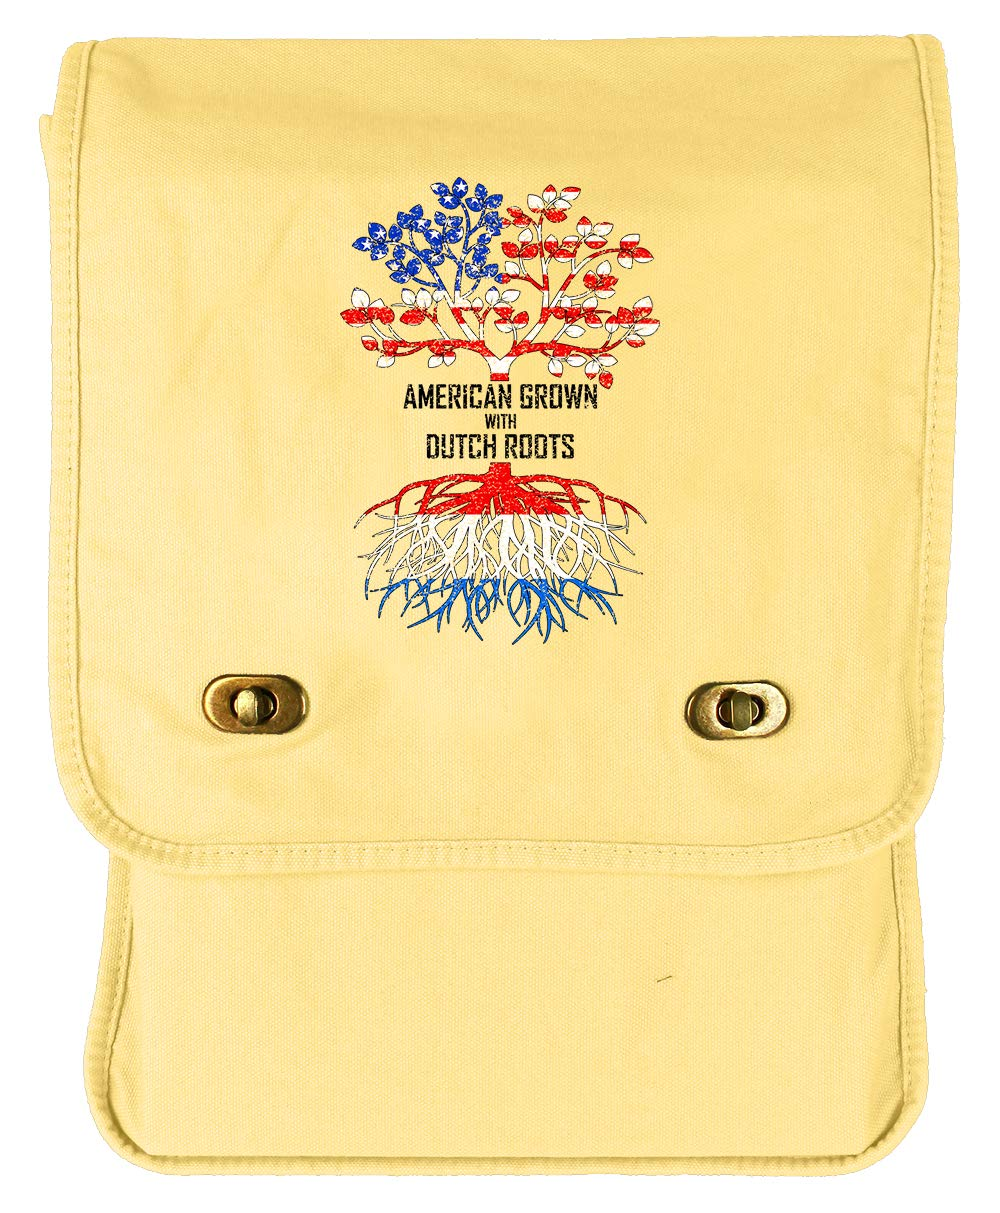 Netherlands Khaki Green Raw Edge Canvas Messenger Bag Tenacitee American Grown with Dutch Roots